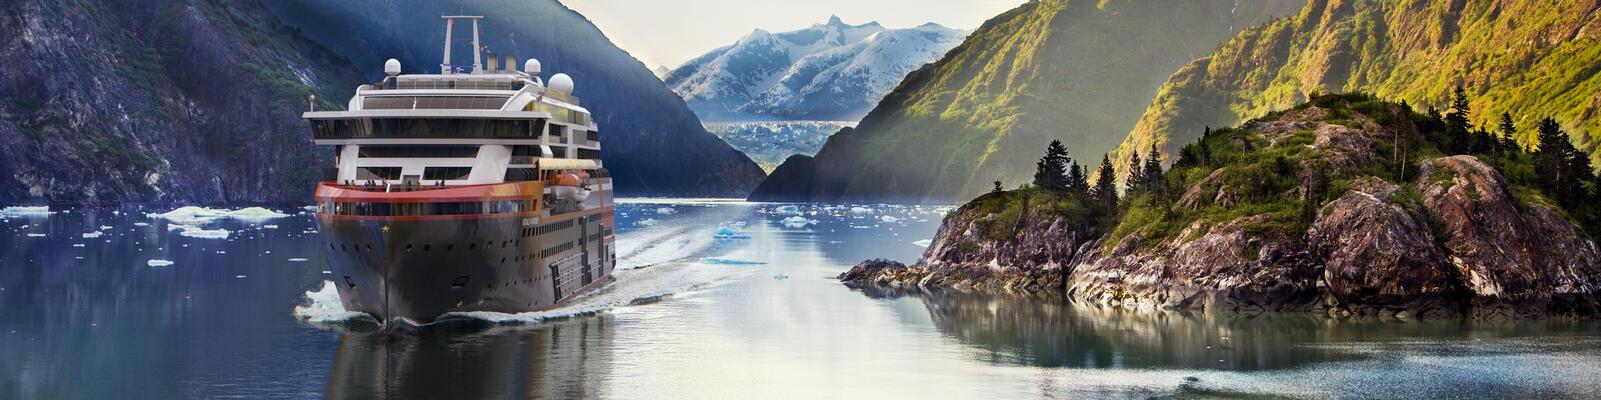 Hurtigruten Cruises 2020 Prices Itineraries Activities